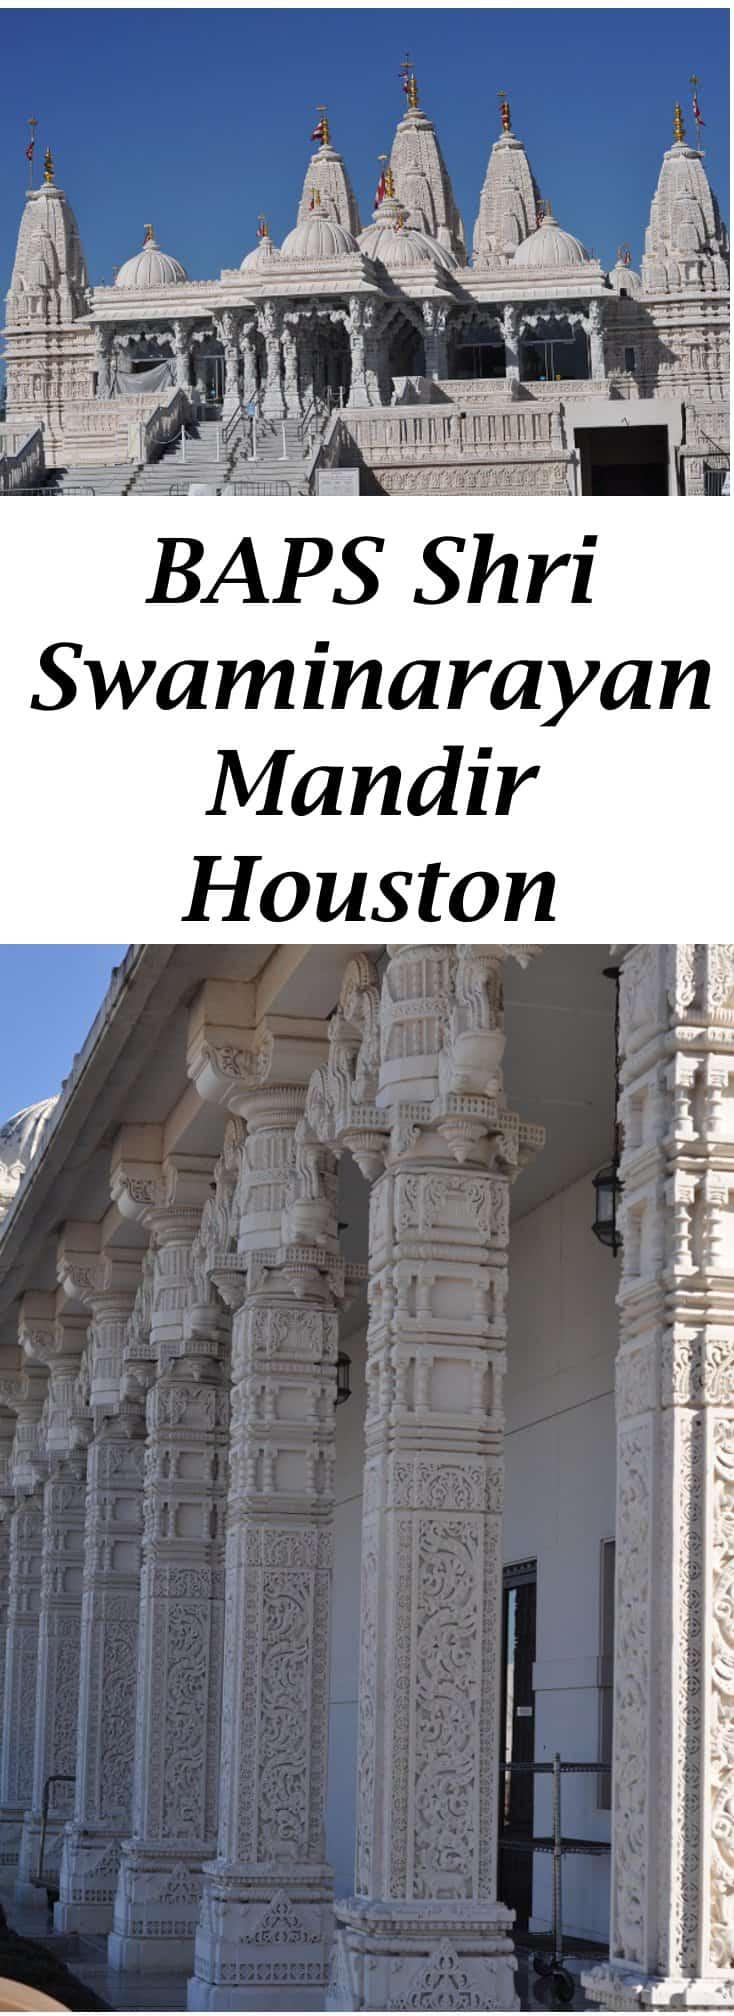 BAPS Shri Swaminarayan Mandir Houston BigKidSmalCity HoustonParents Magazine Pin